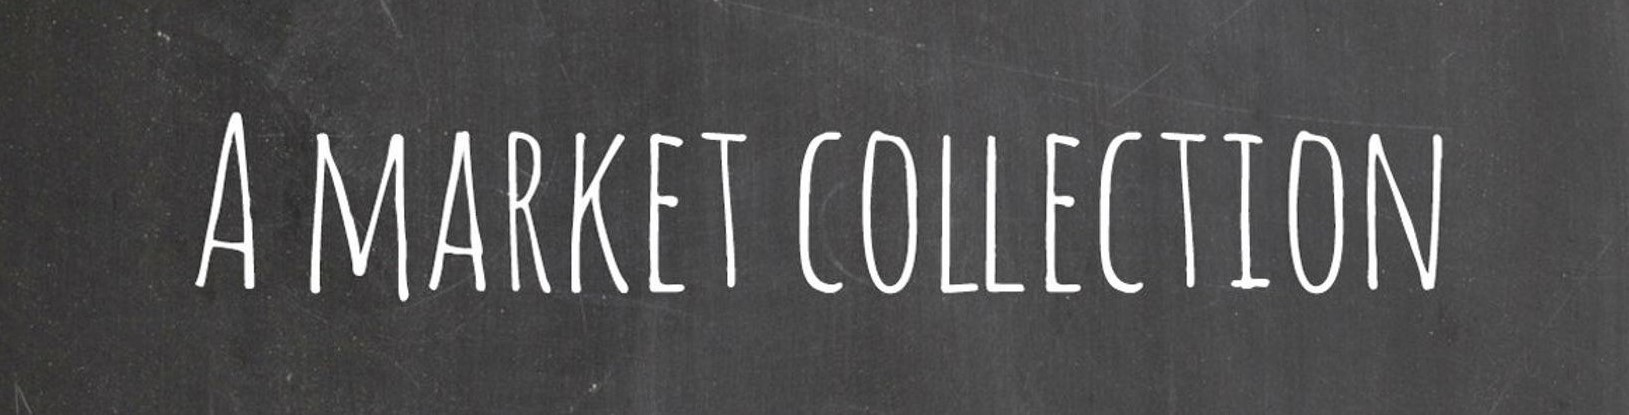 marketcollectioncrop3